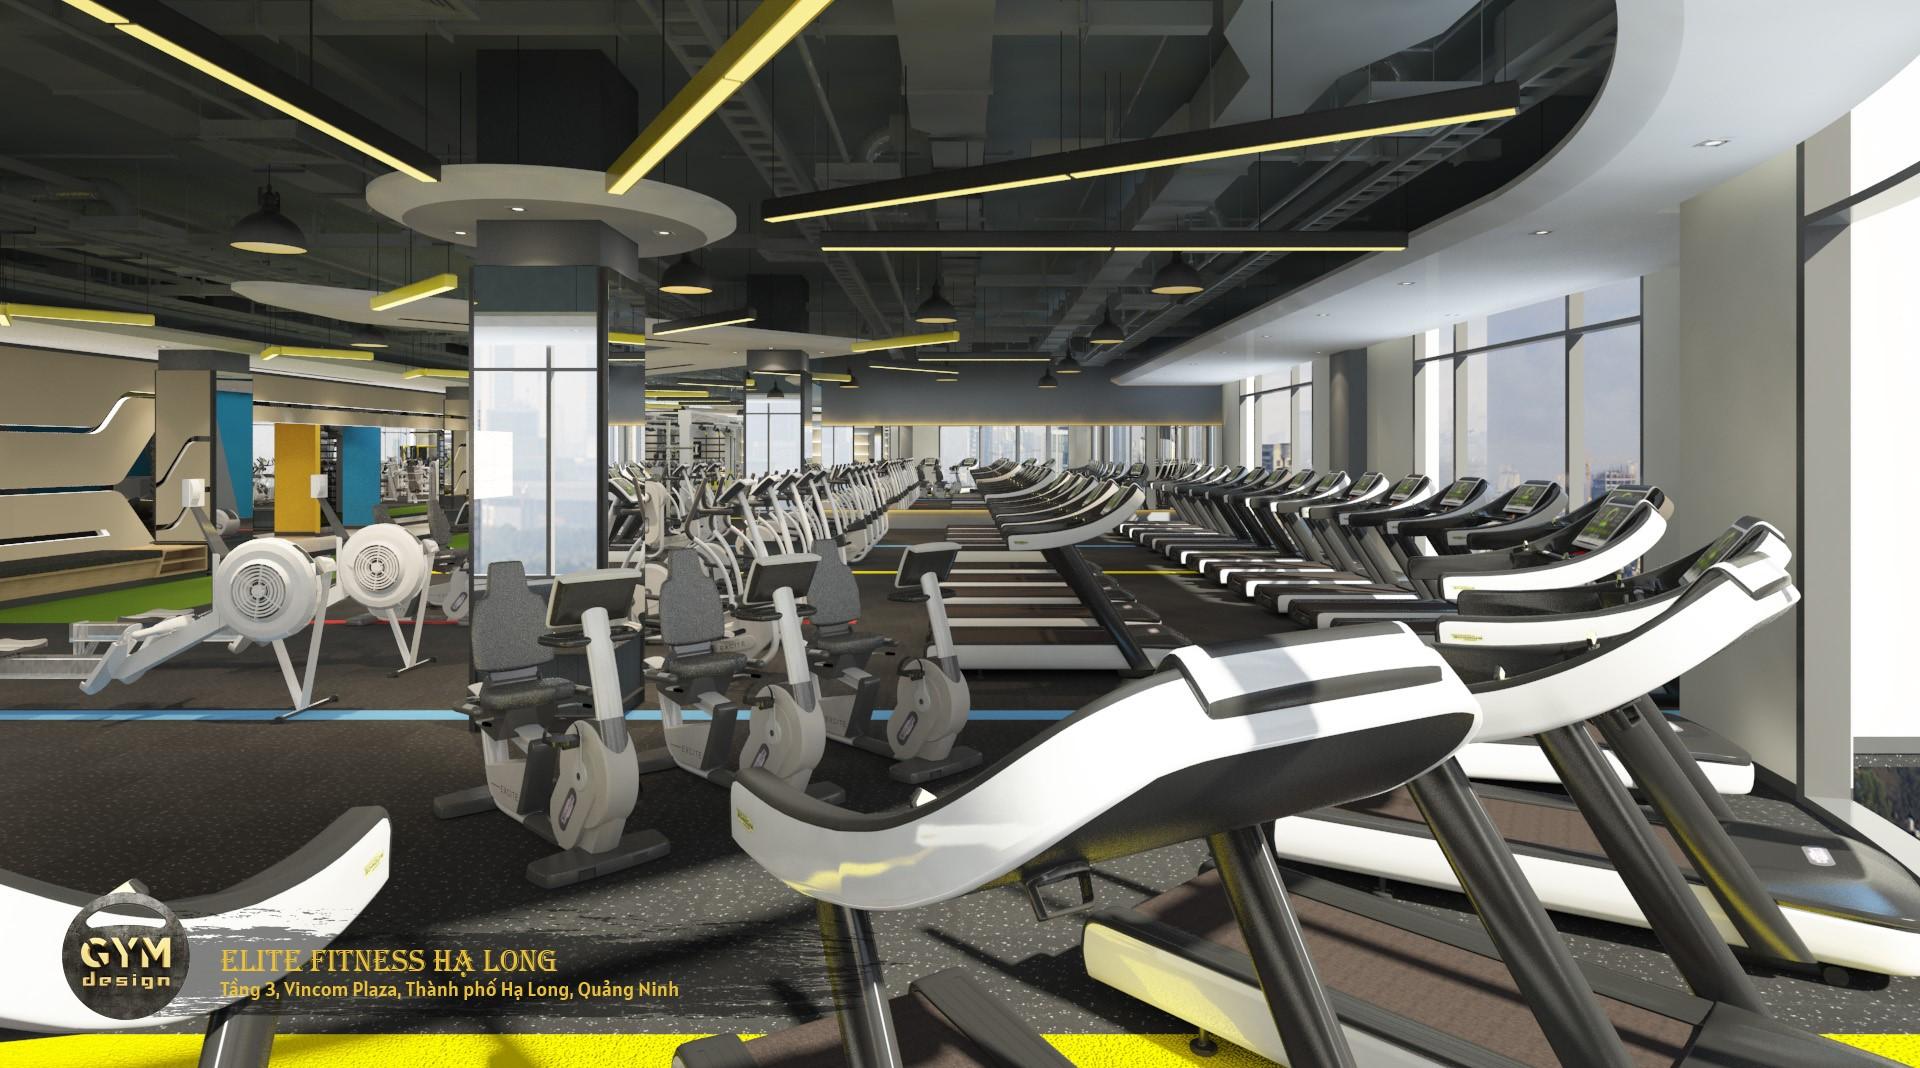 thiet-ke-phong-gym-elite-fitness-ha-long-43